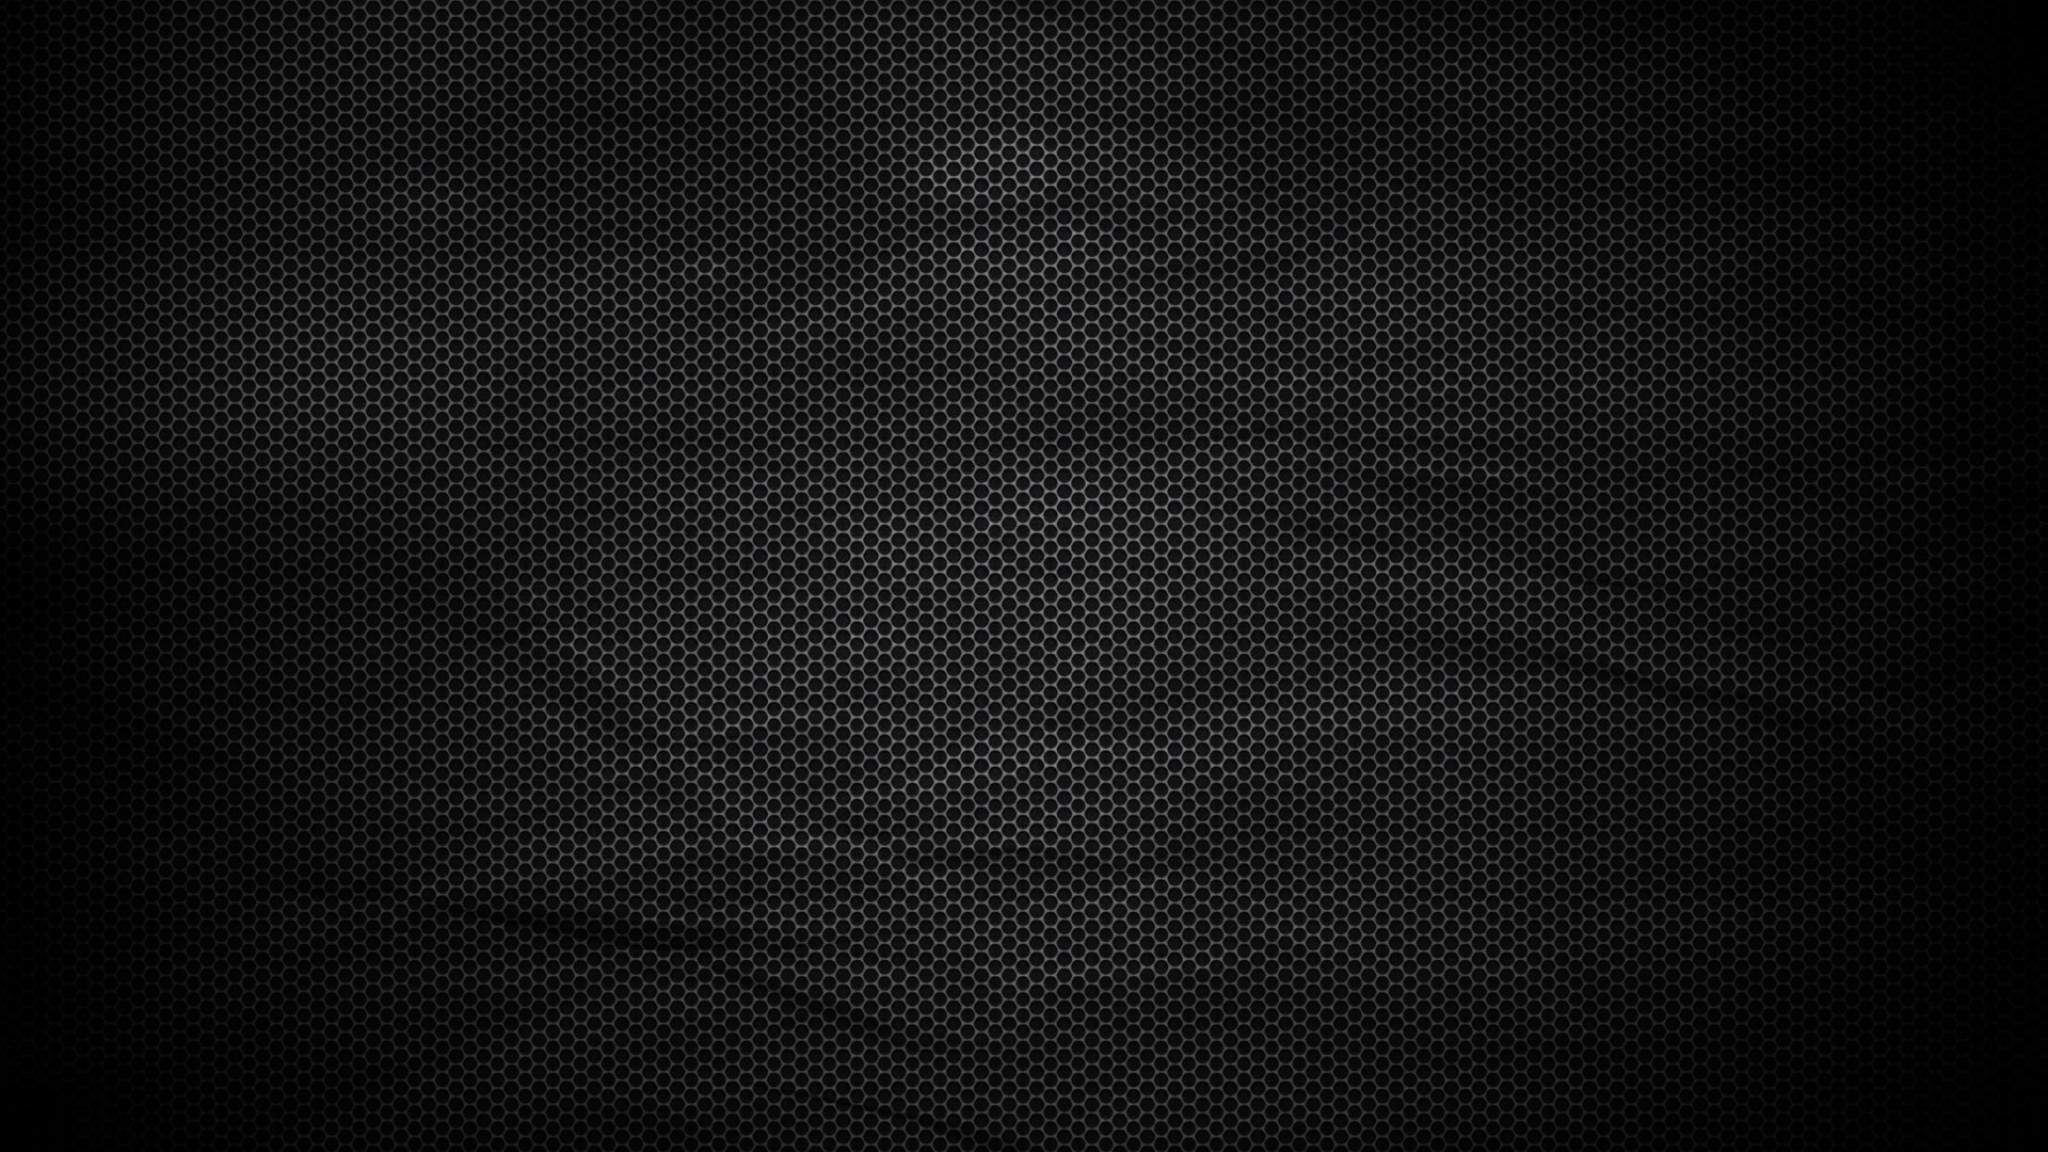 Wallpaper background, lines, circles, size, dark